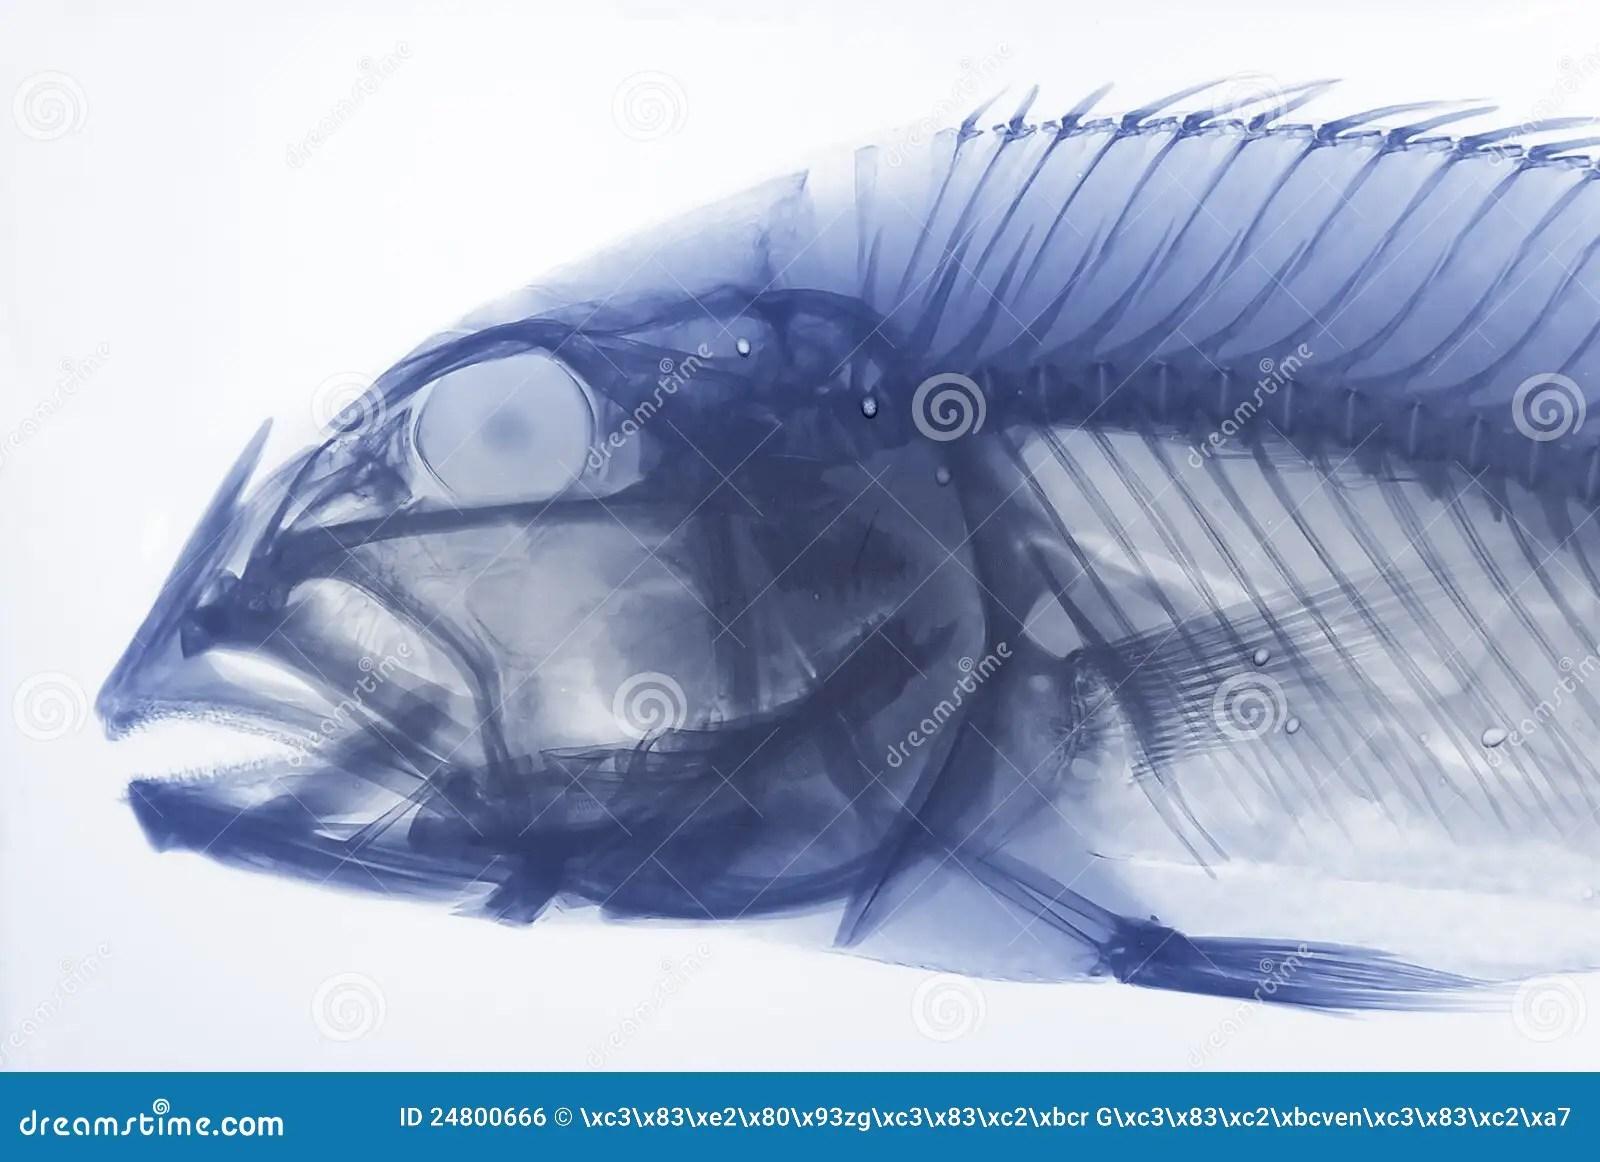 Xray Of A Fish Stock Photo Image Of Radiography Bone